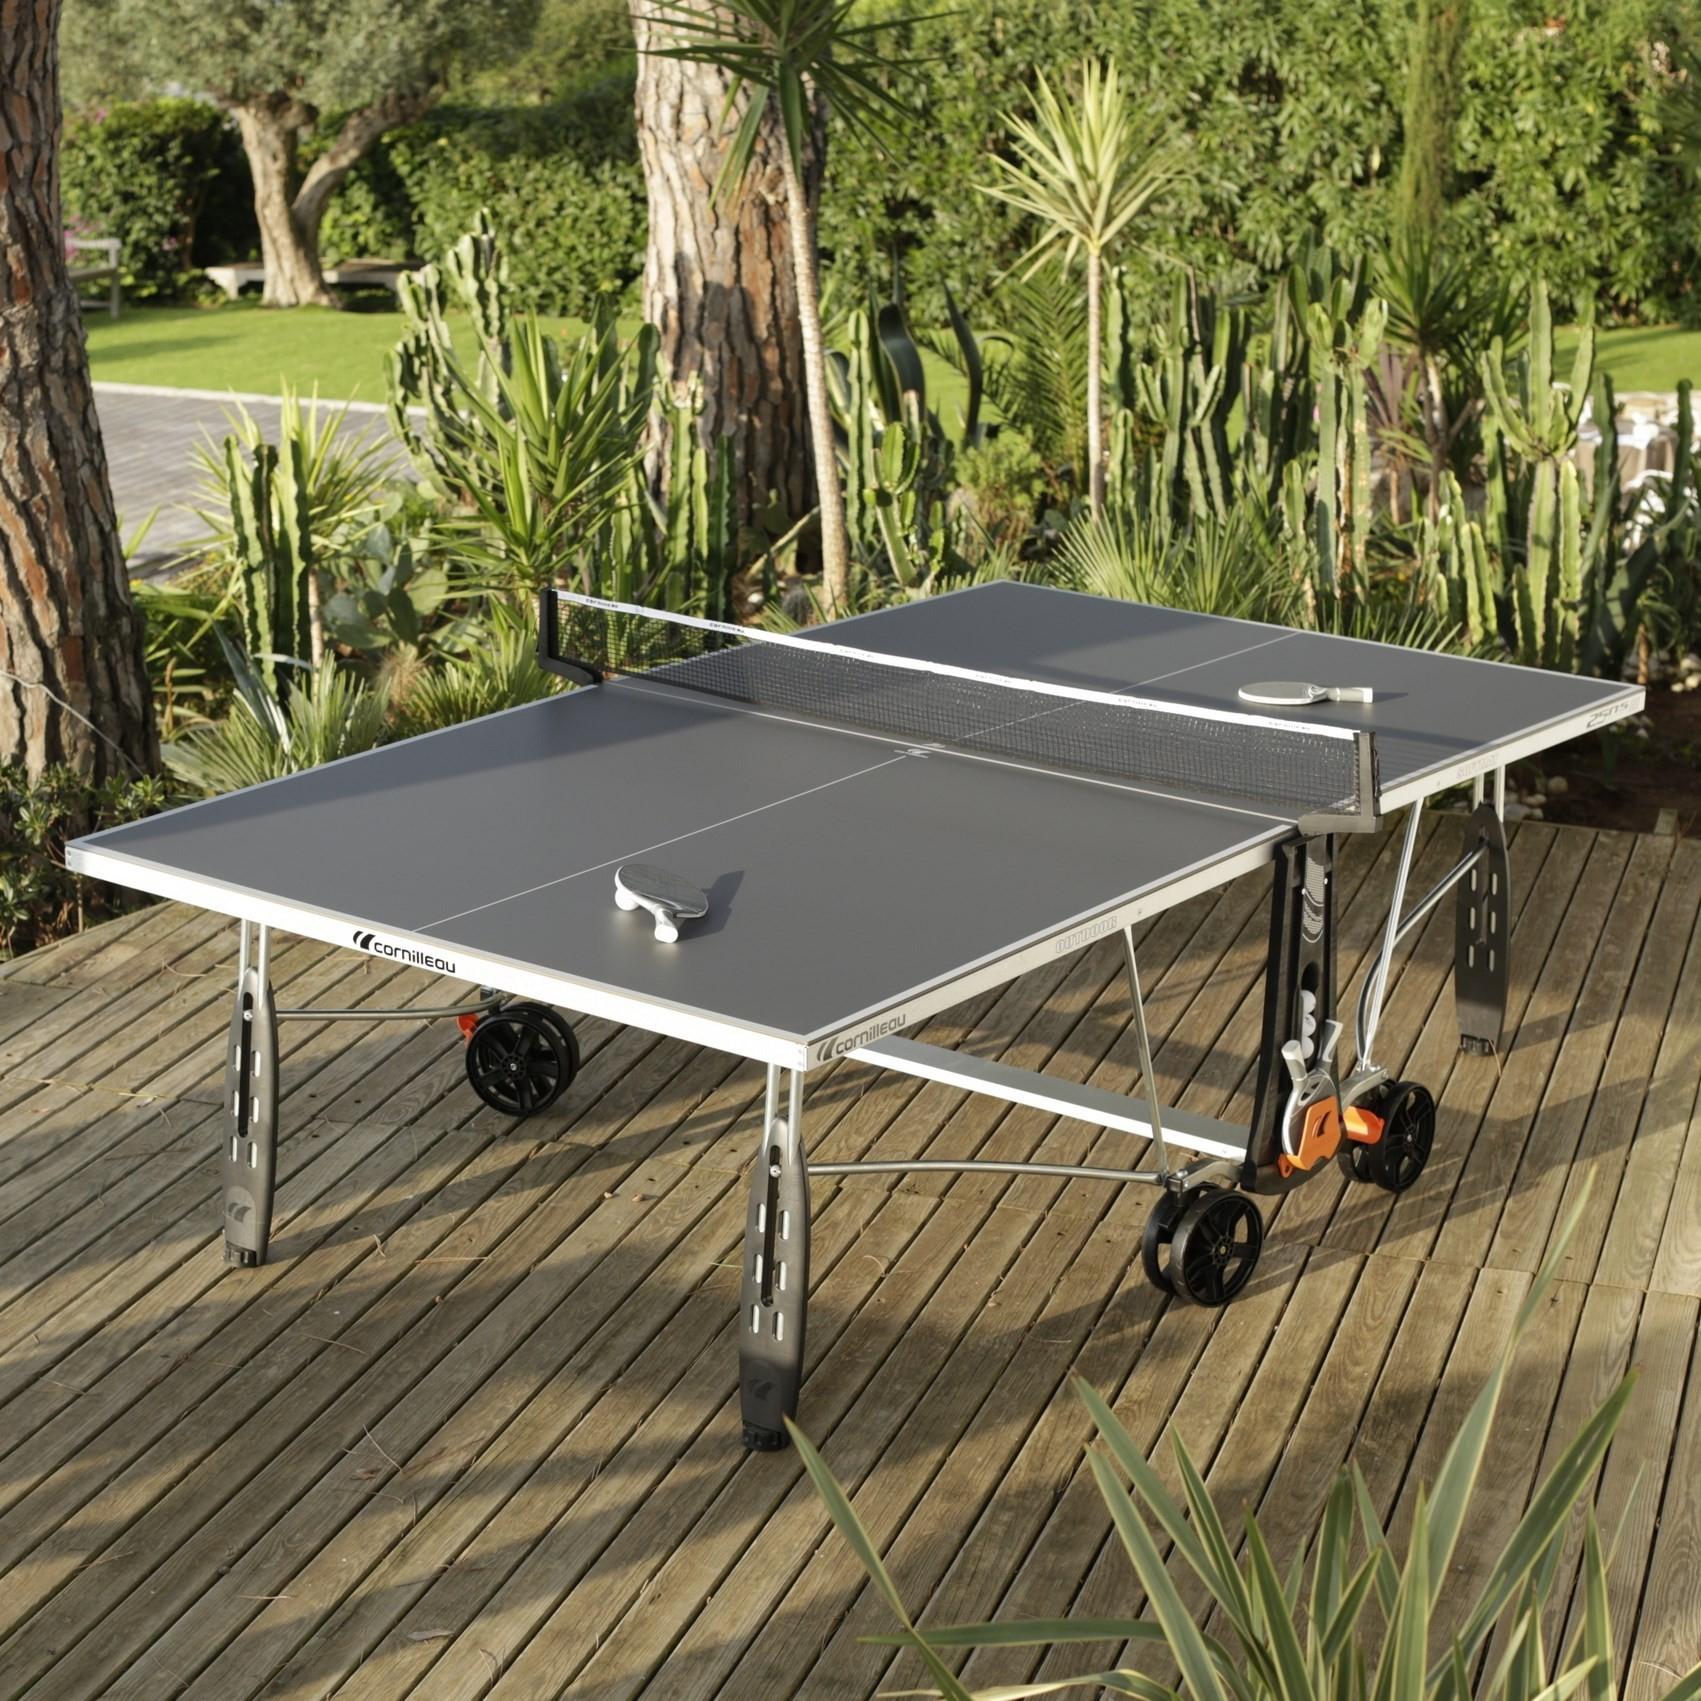 Table De Ping Pong Exterieur Occasion Inspirant Image Table De Ping Pong Cornilleau Outdoor Pas Cher Cheap Table De Ping